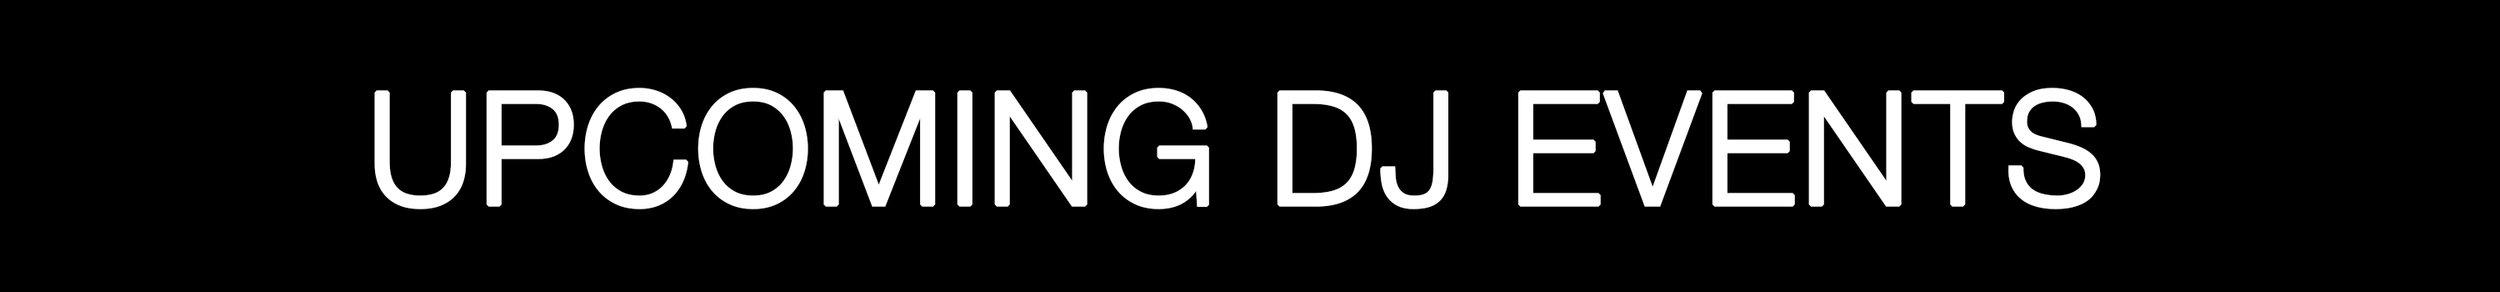 upcoming dj events.jpg